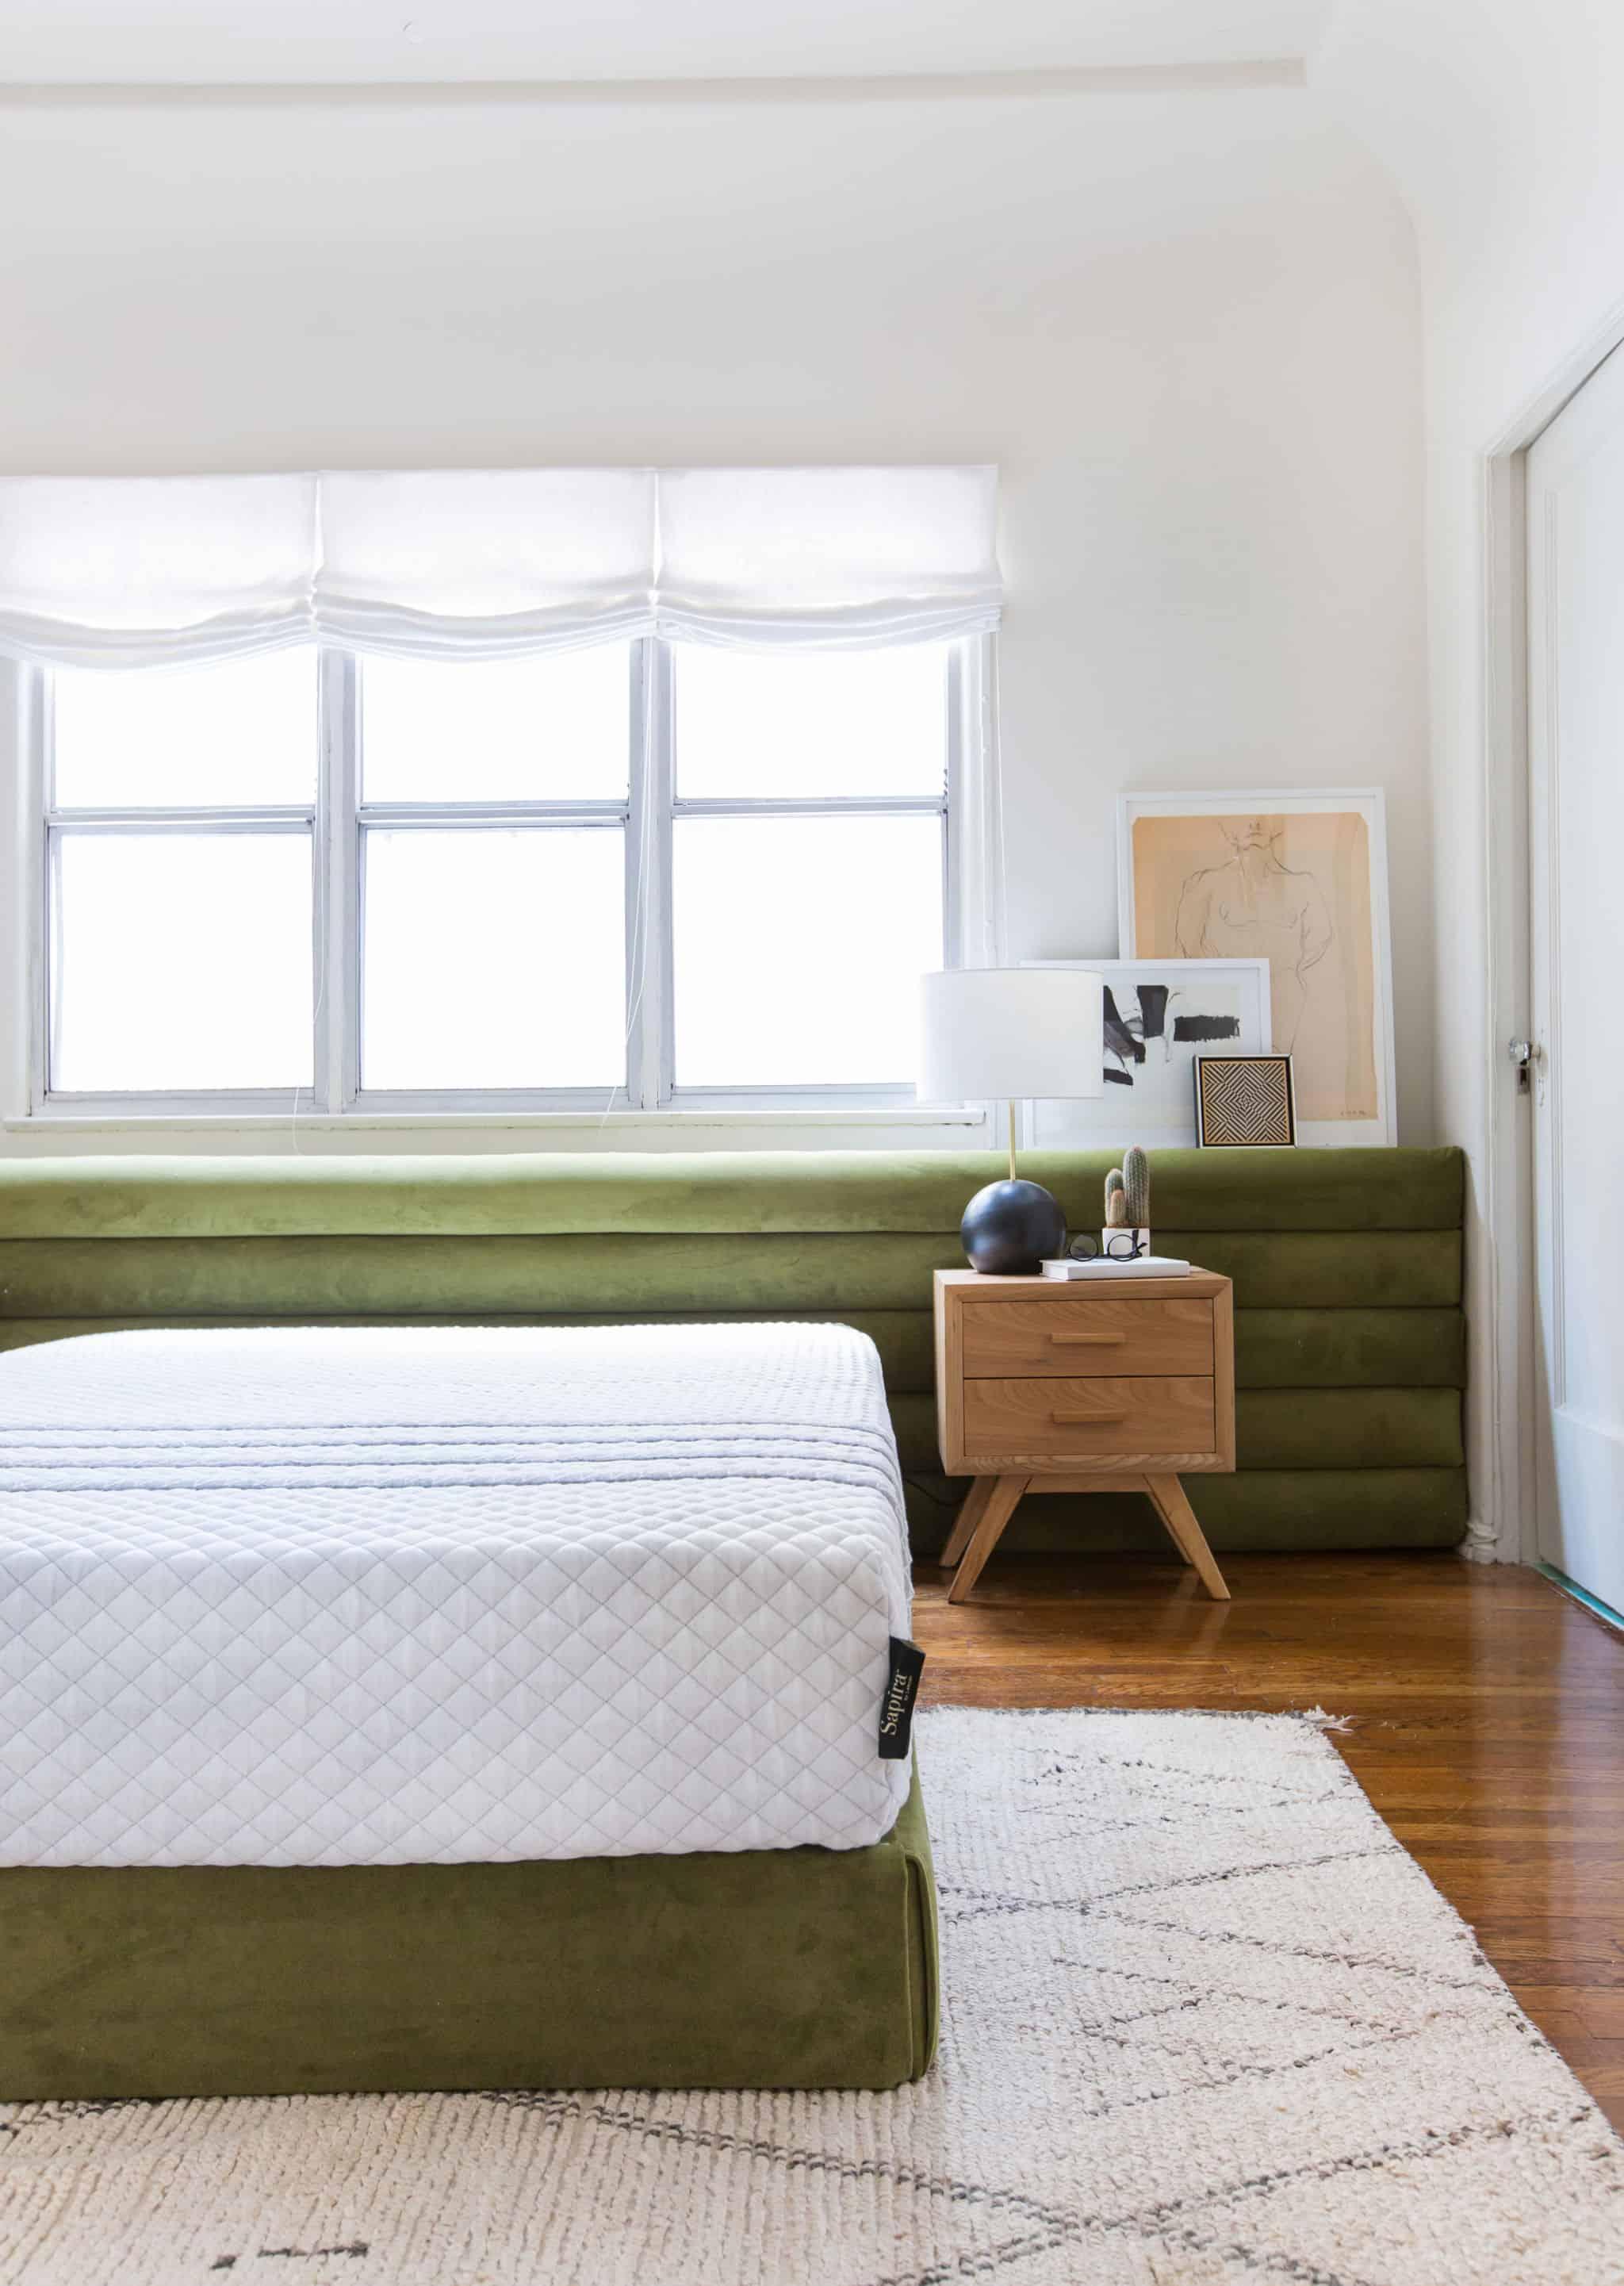 emily-henderson_sapira-mattress_diy-headboard_brady-tolbert_bedroom_green-velvet_channel-tufting_channel-tufted_masculine_boho_chic_headboard_4